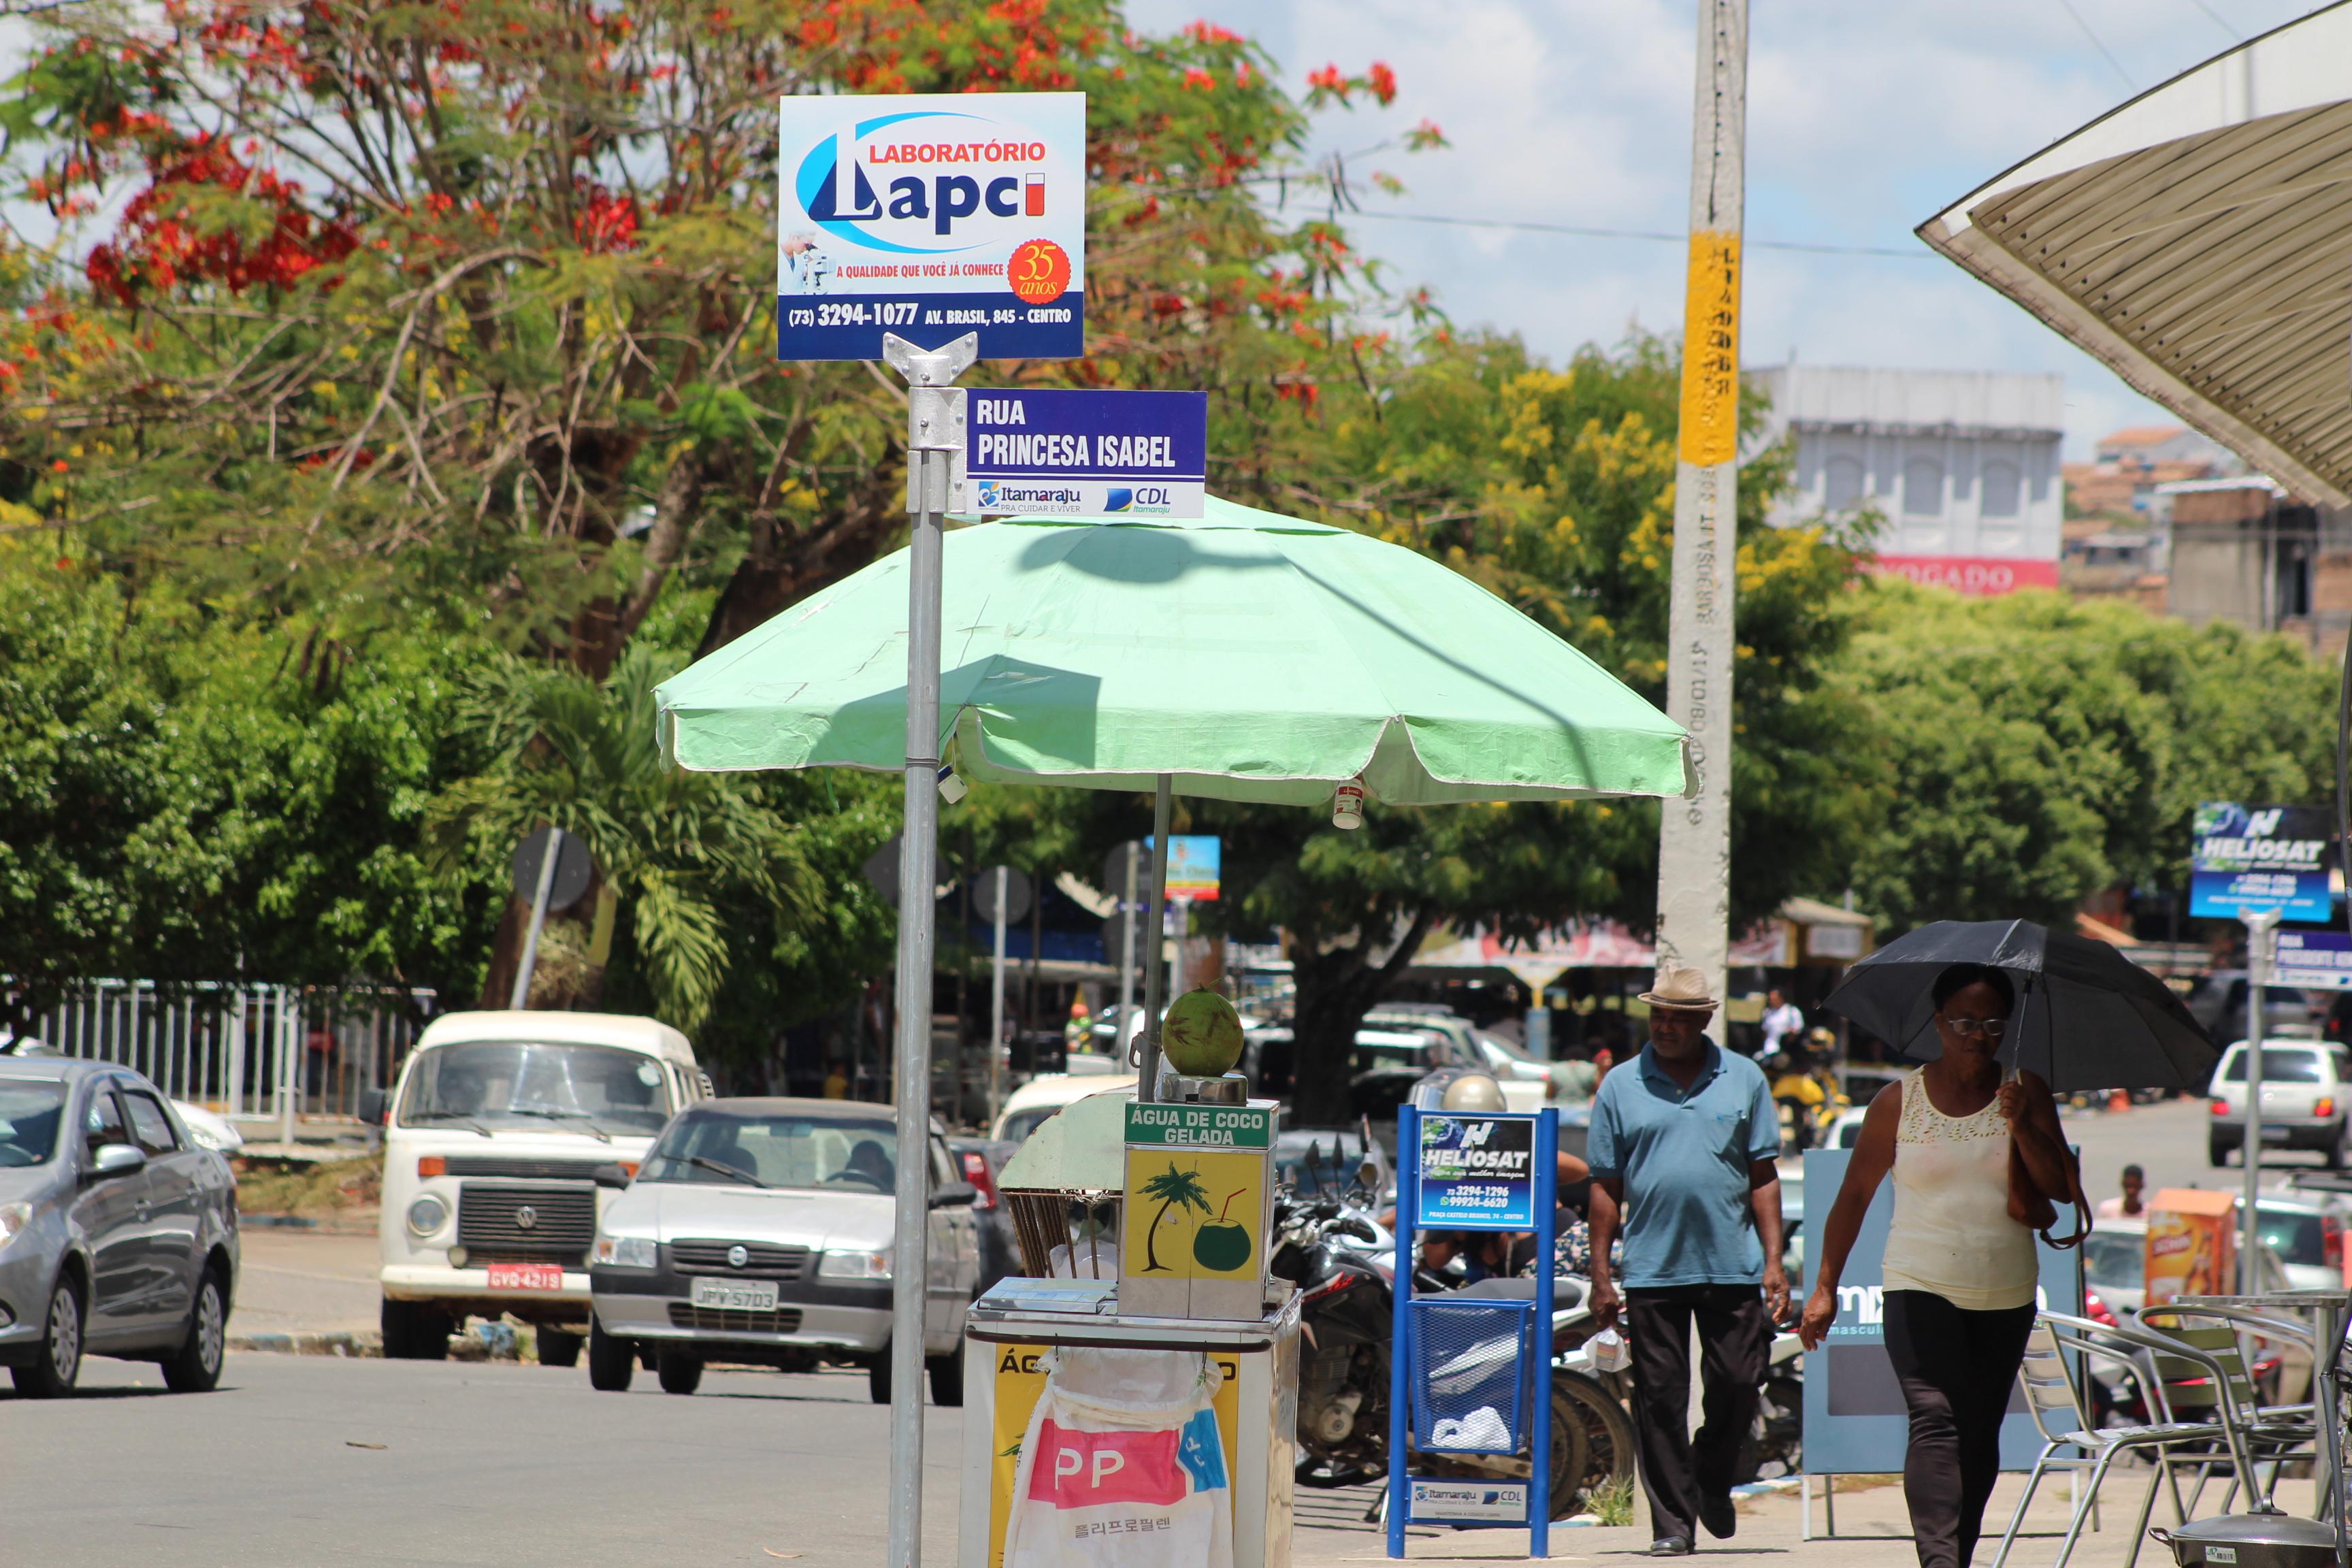 Comercio de Itamaraju funcionará normalmente em dias de carnaval 2021